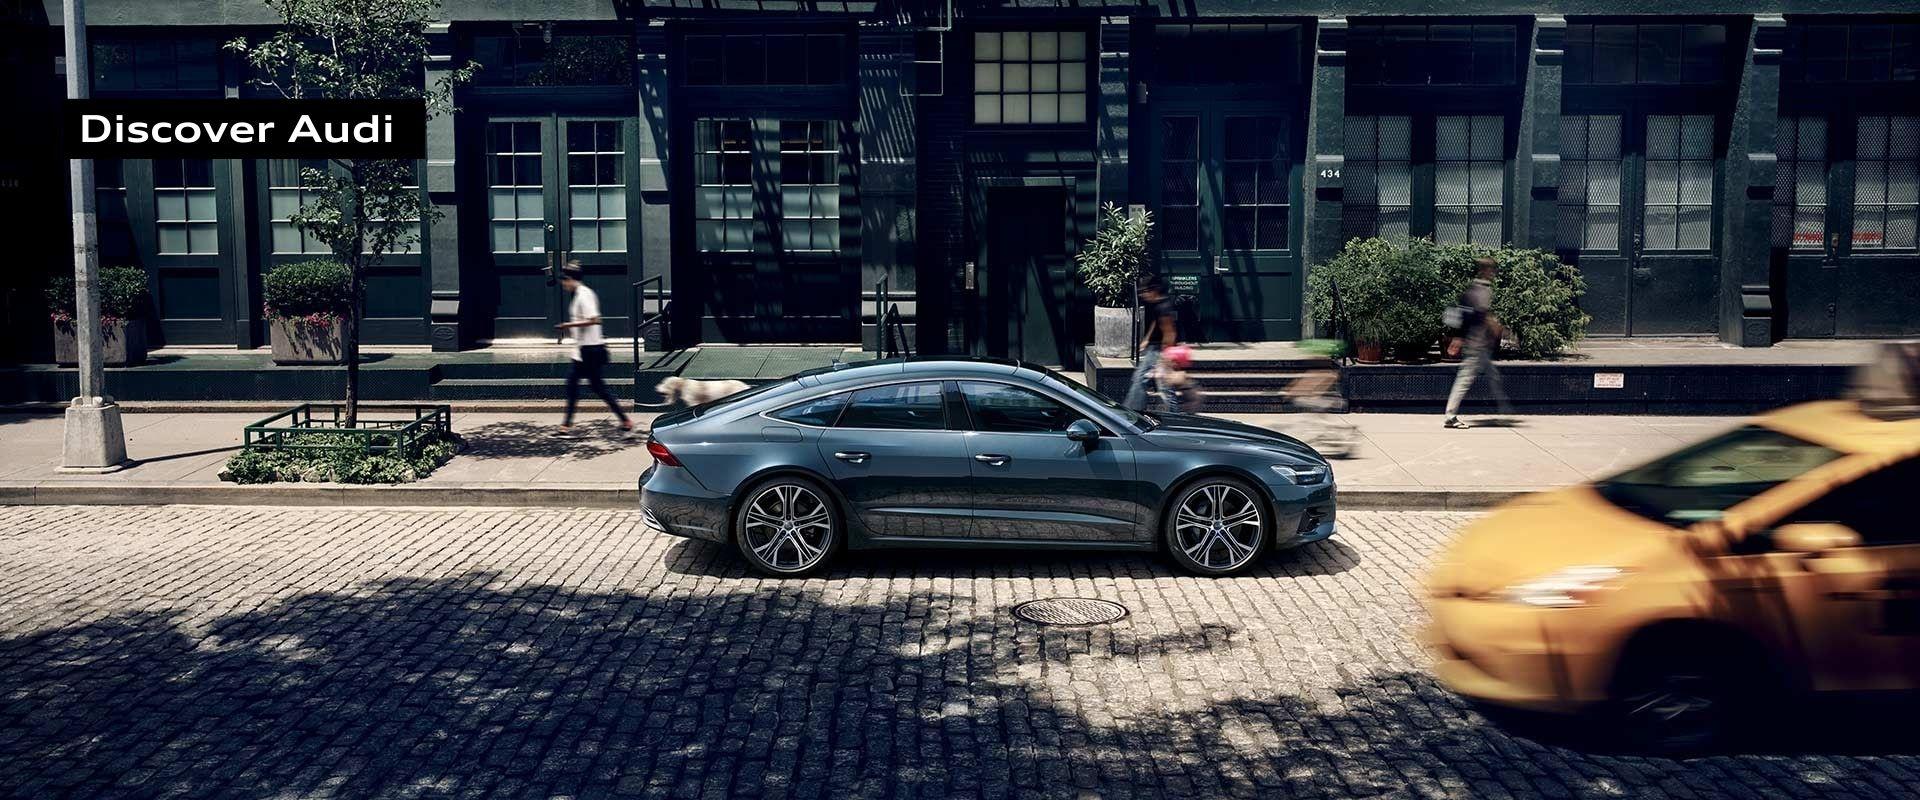 Discover Audi